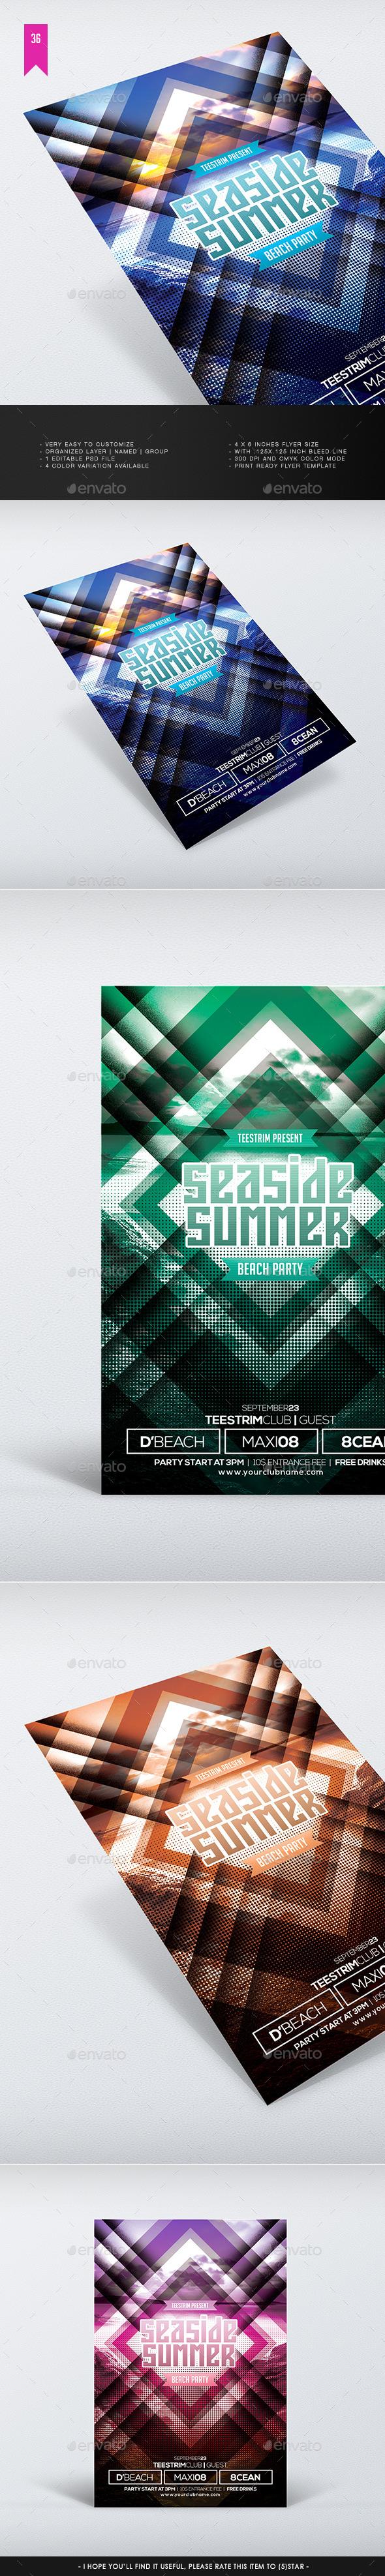 Summer V.2 Flyer Template